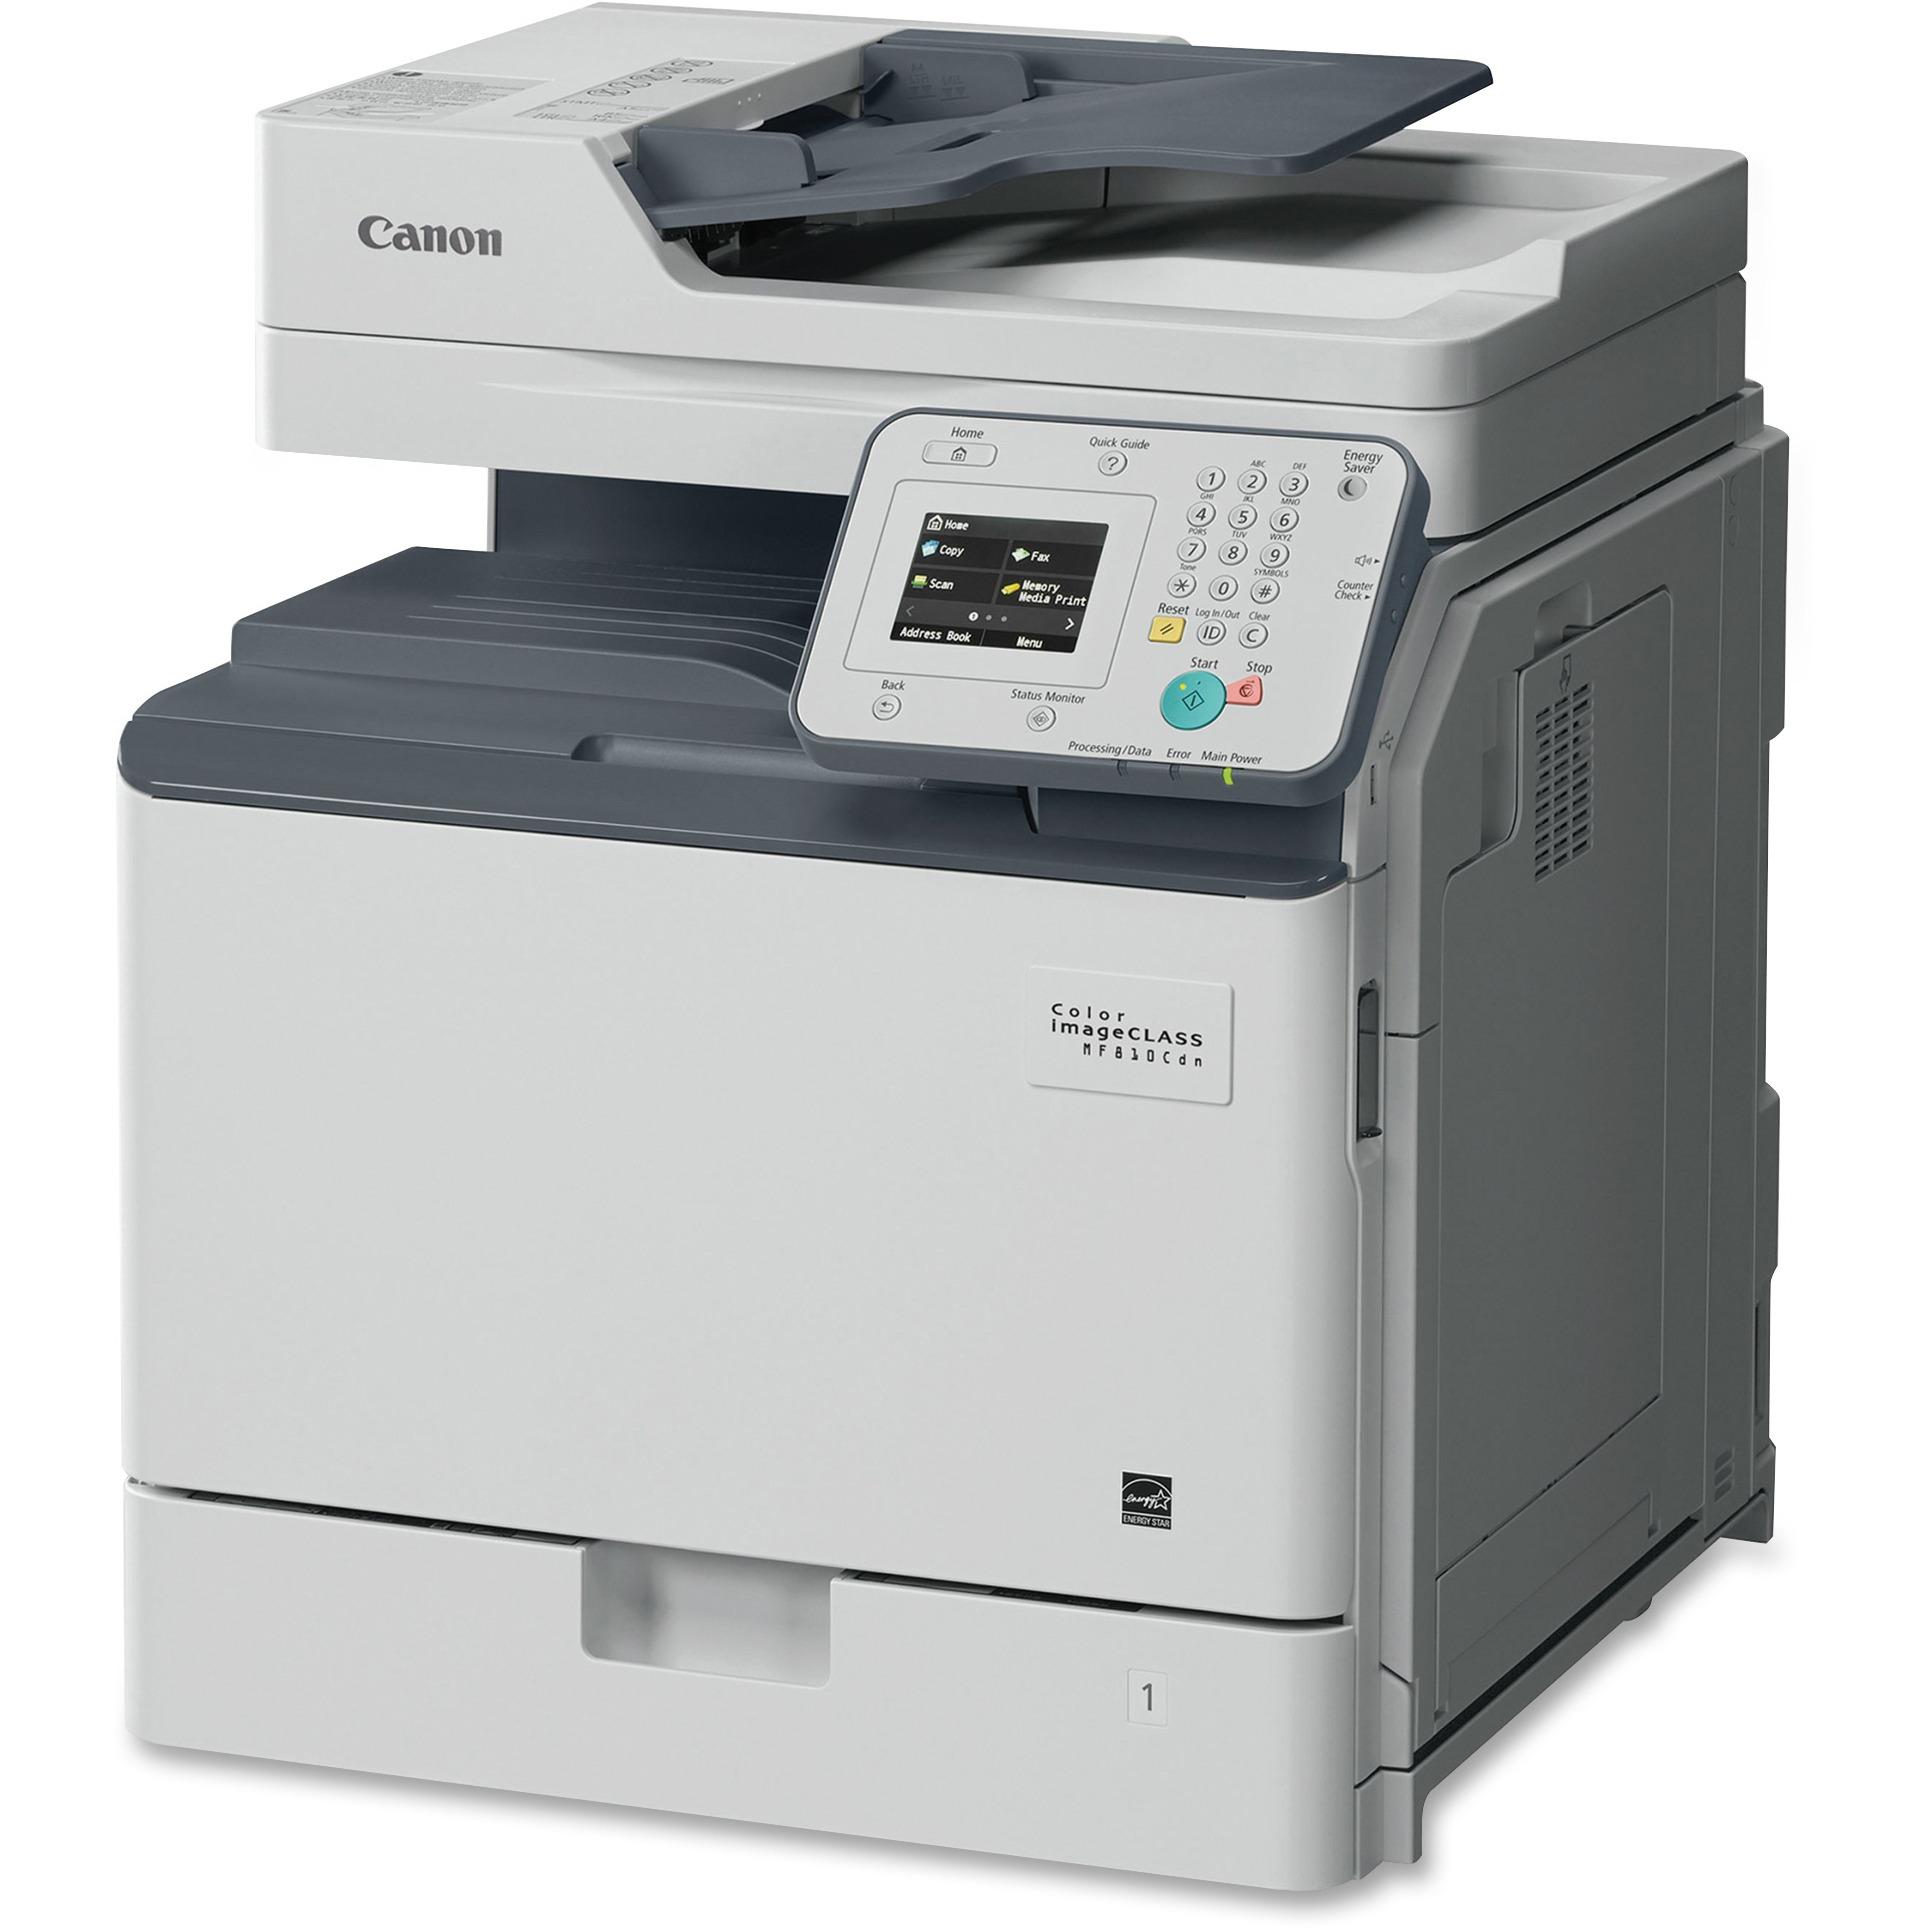 ImageClass MF810Cdn MF Laser Printer